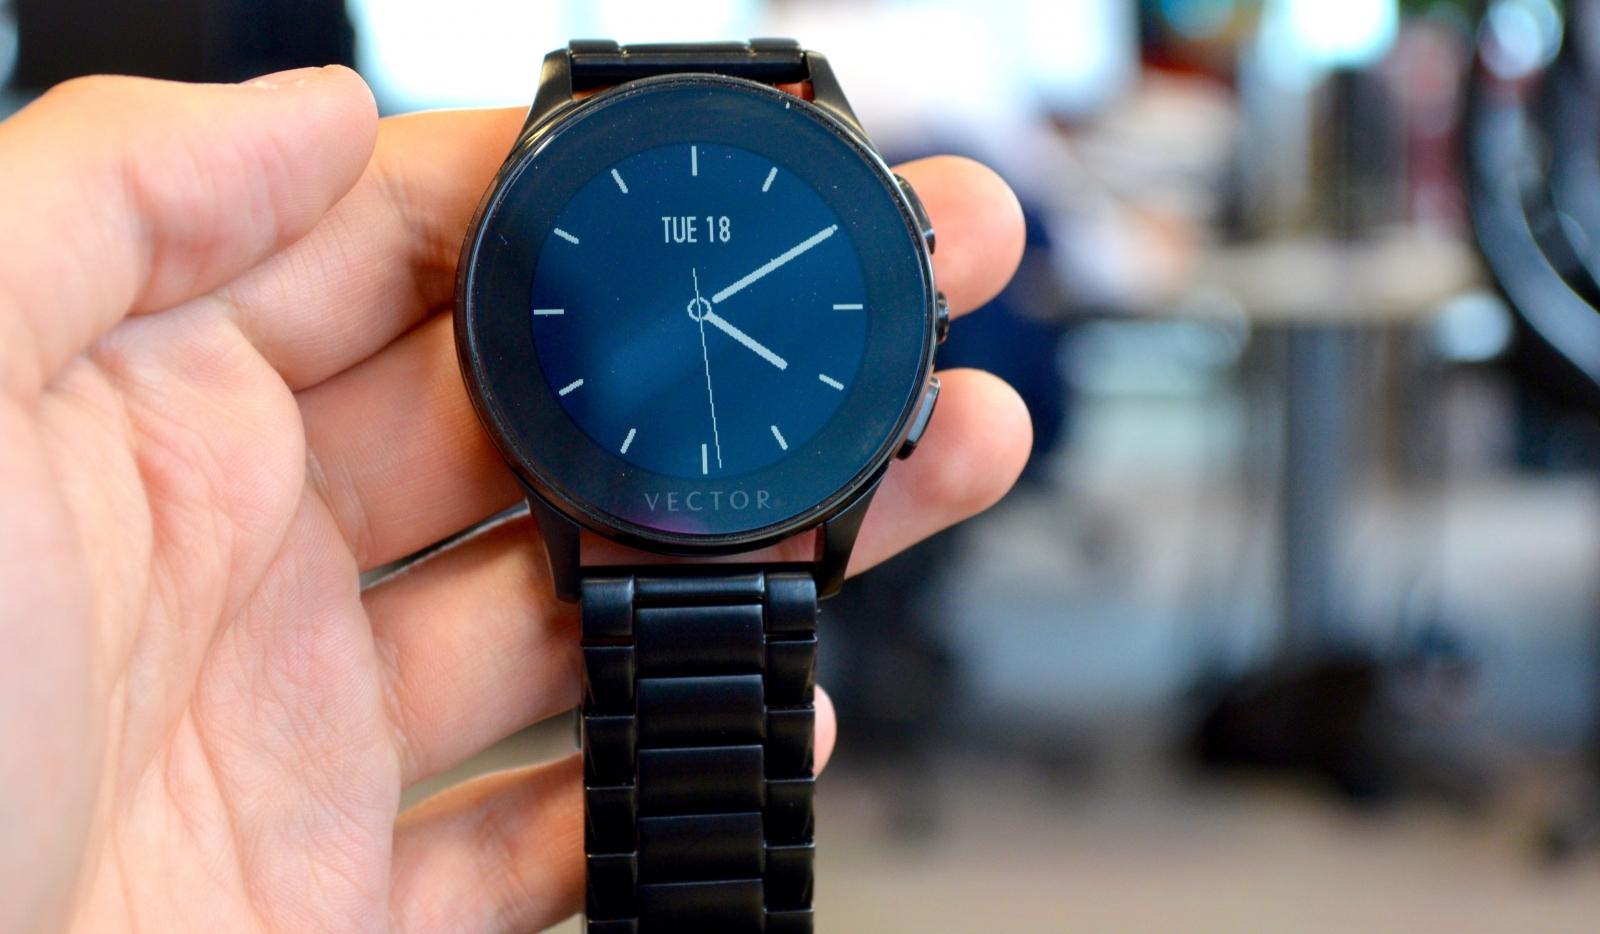 Vector Luna smartwatch